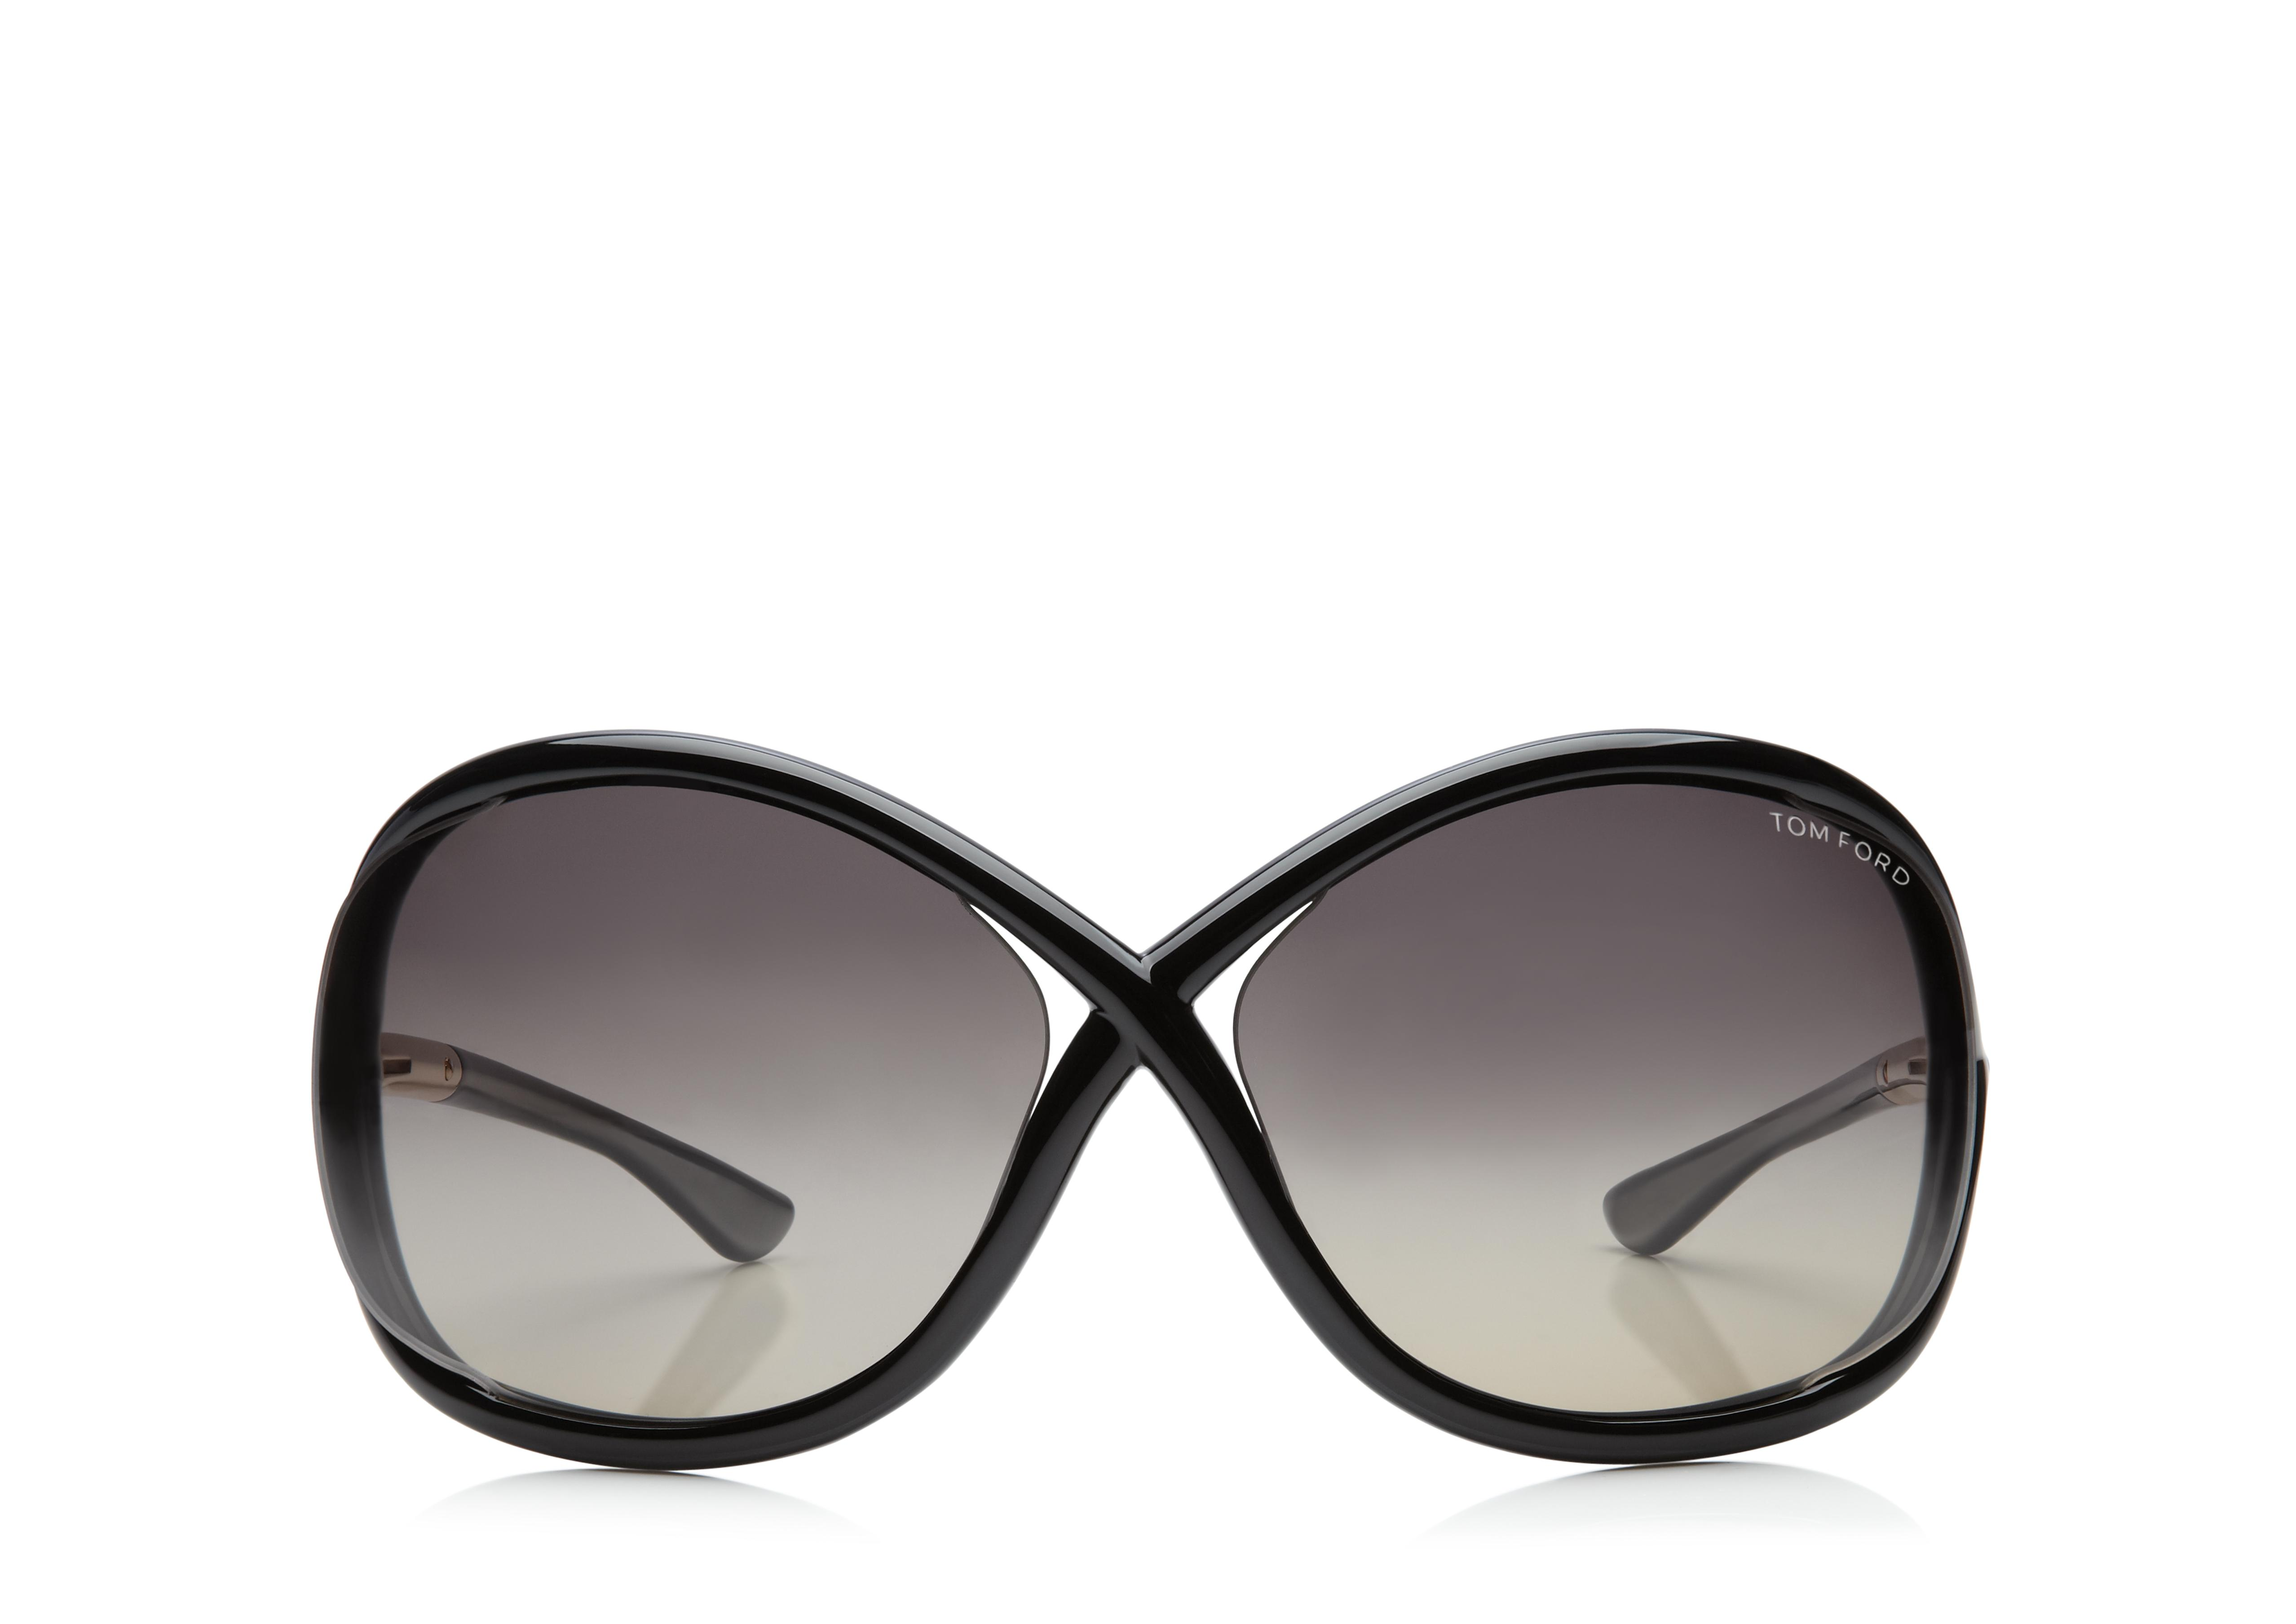 Tom Ford Oversized Round Sunglasses